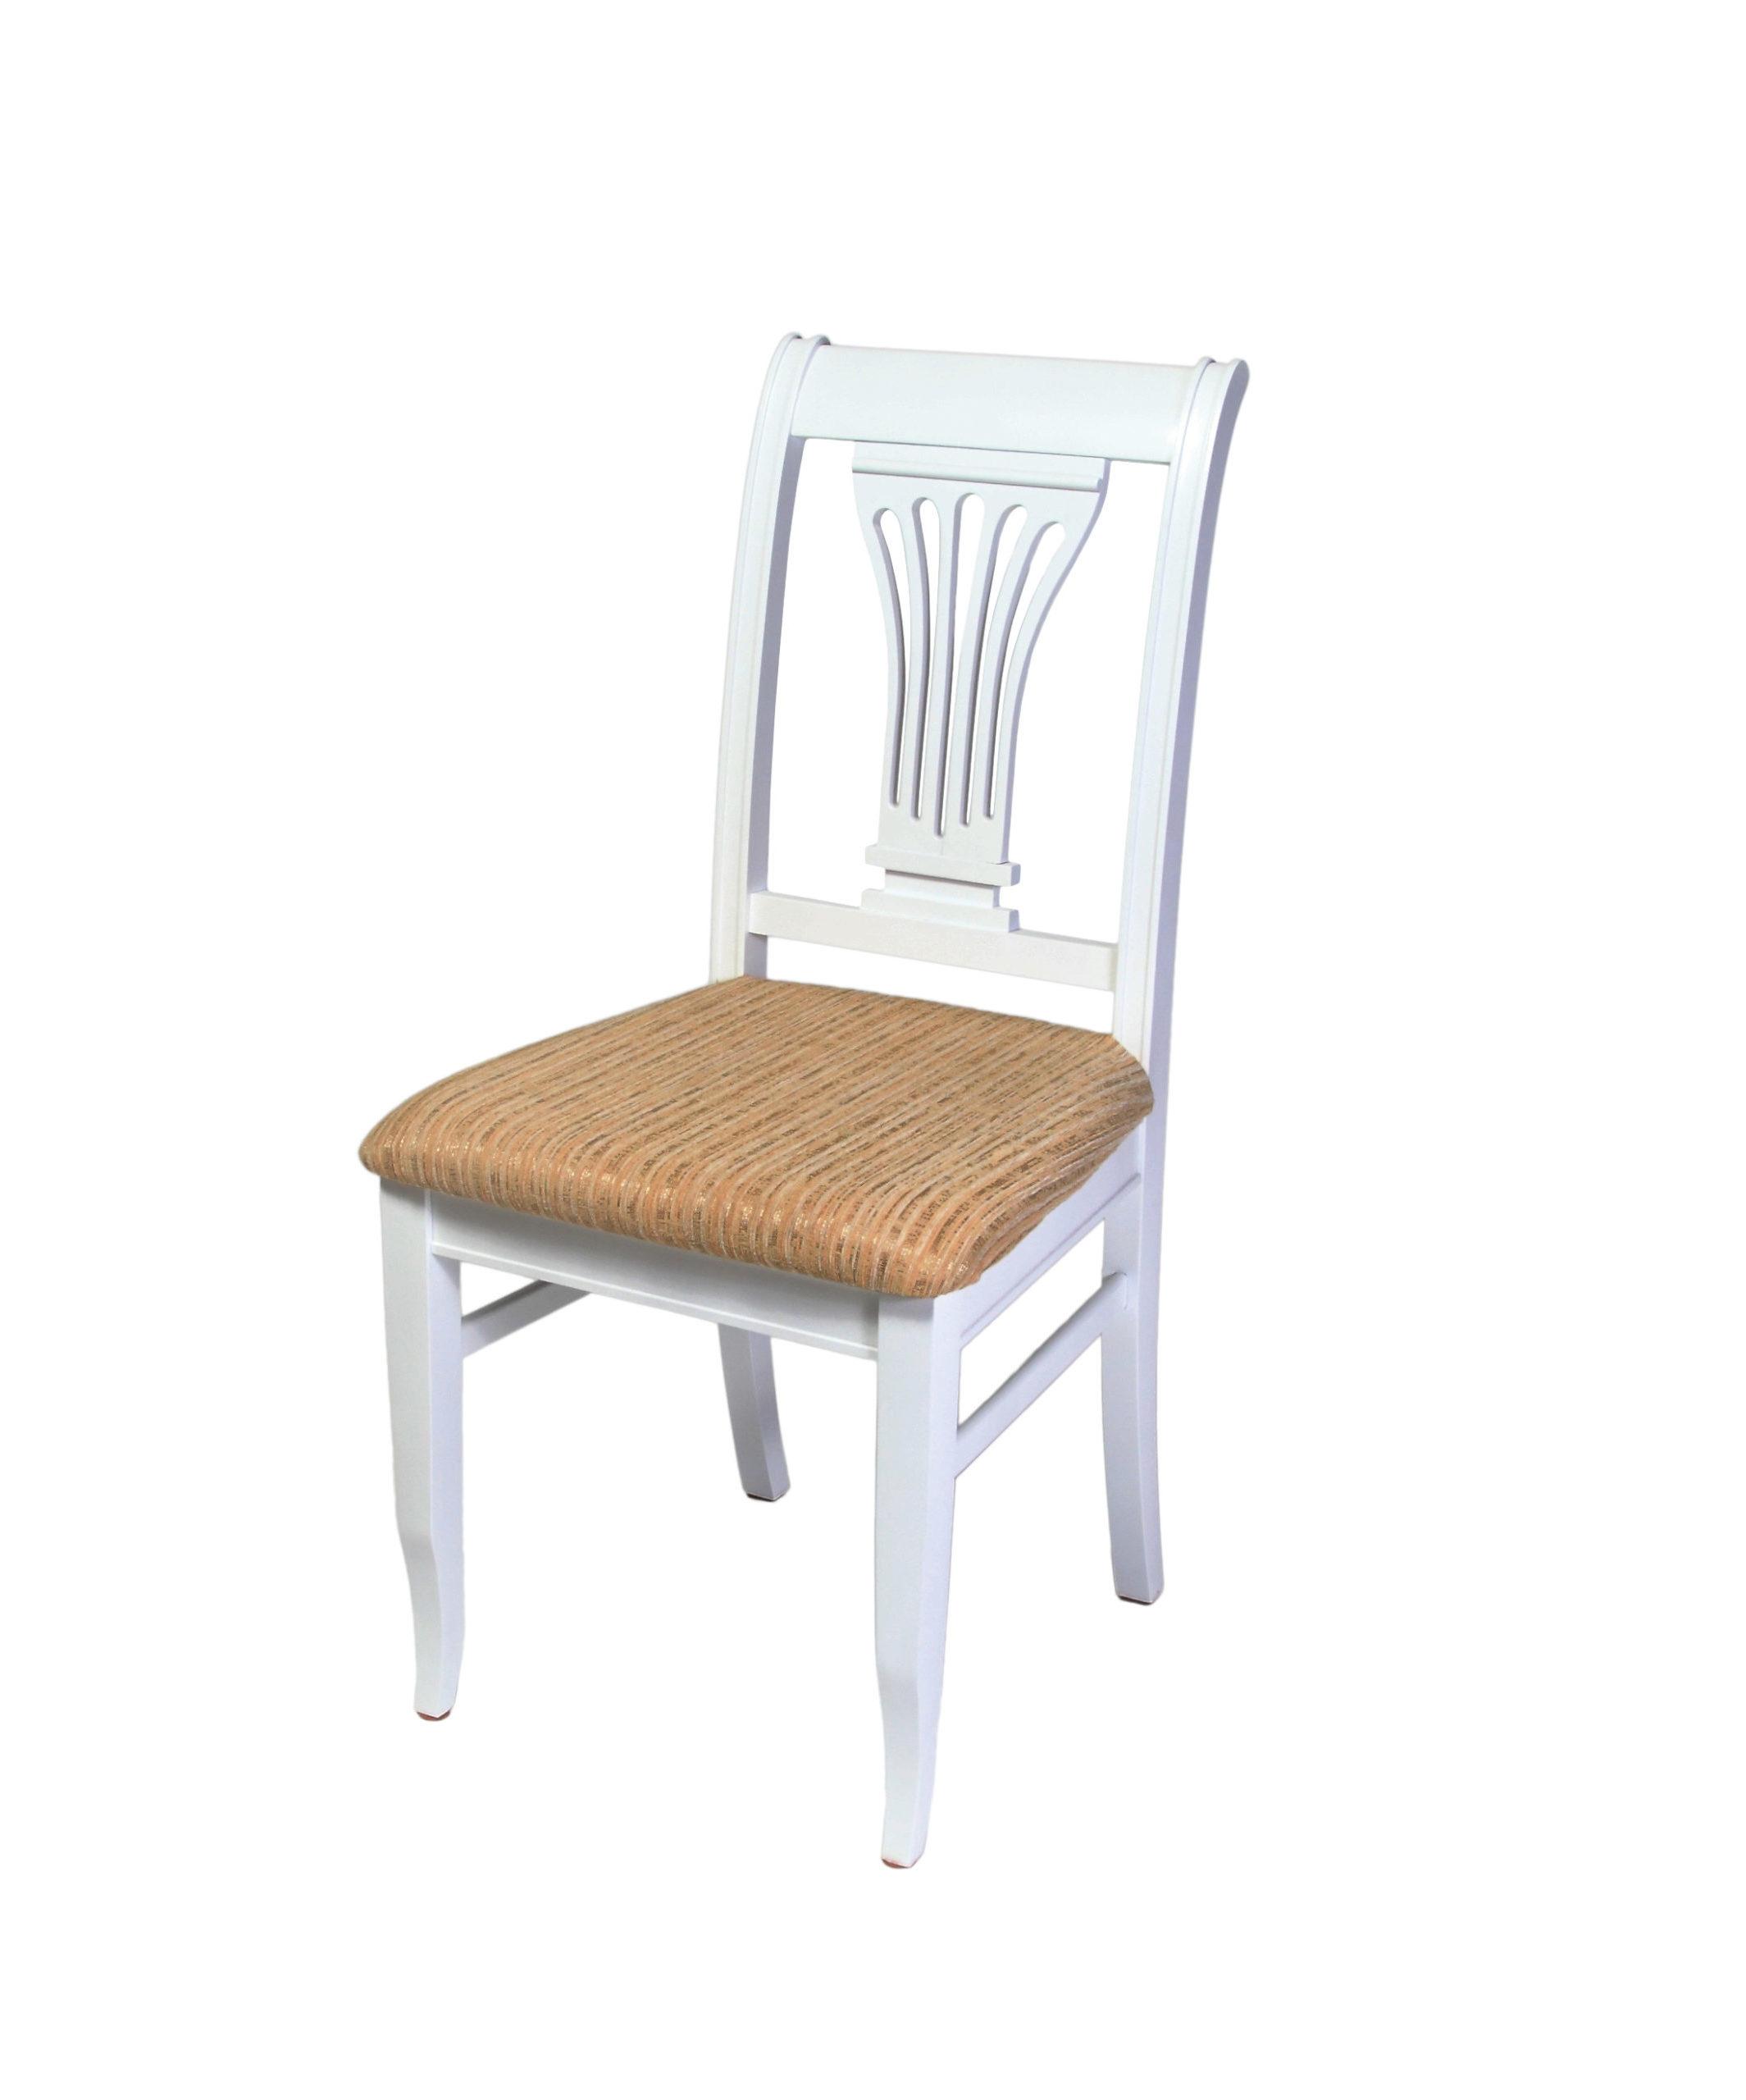 6396. Каркас стула из массива бука.